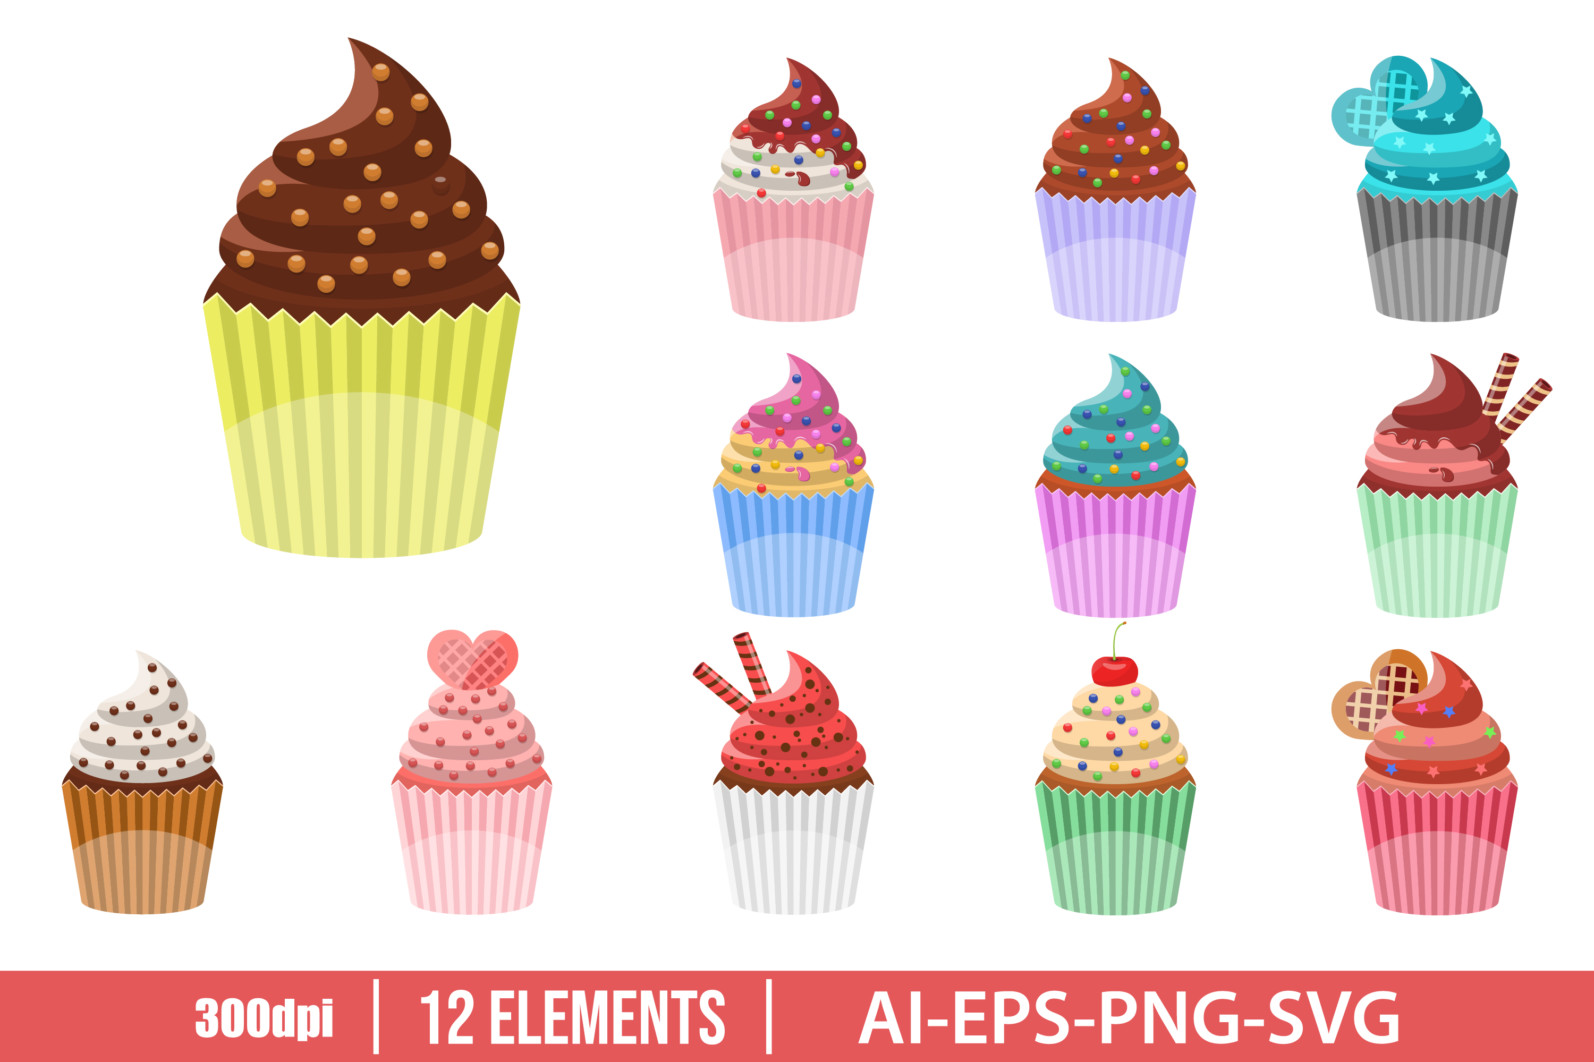 Delicious cupcake clipart vector design illustration. Vector Clipart Print - CUPCAKE scaled -